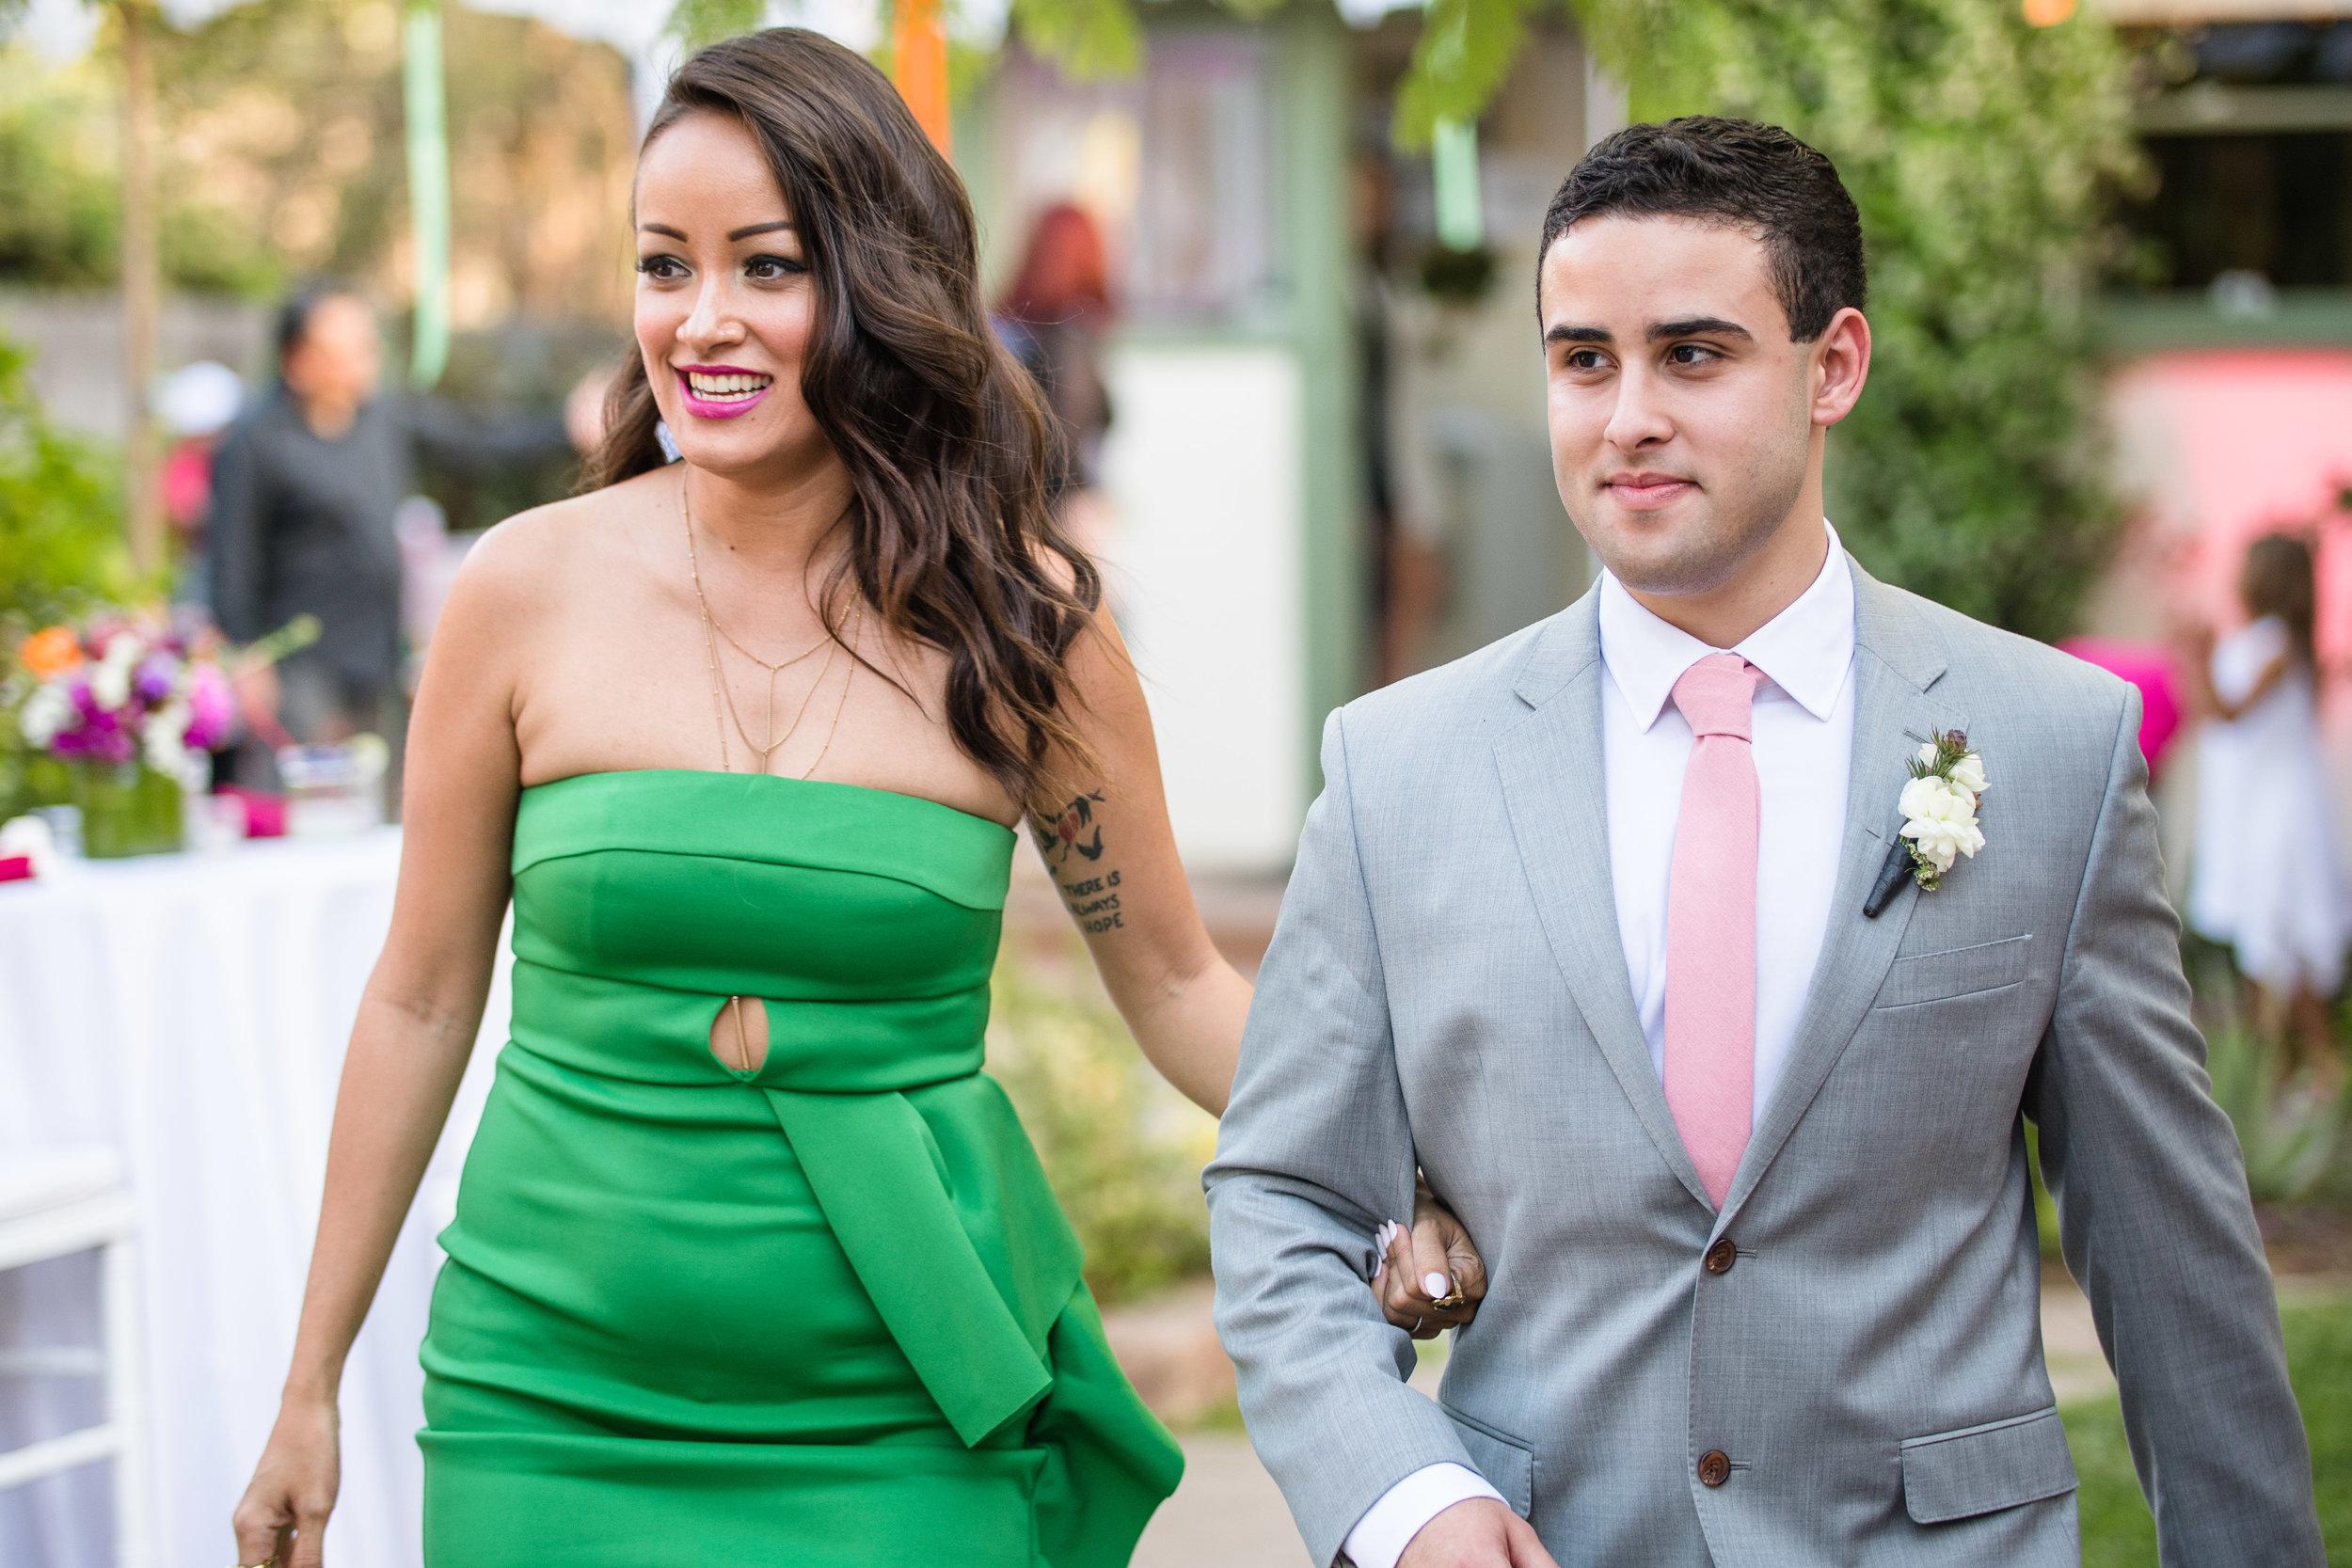 Vibrant Fiesta Backyard Wedding Reception matron of honor in green.jpg